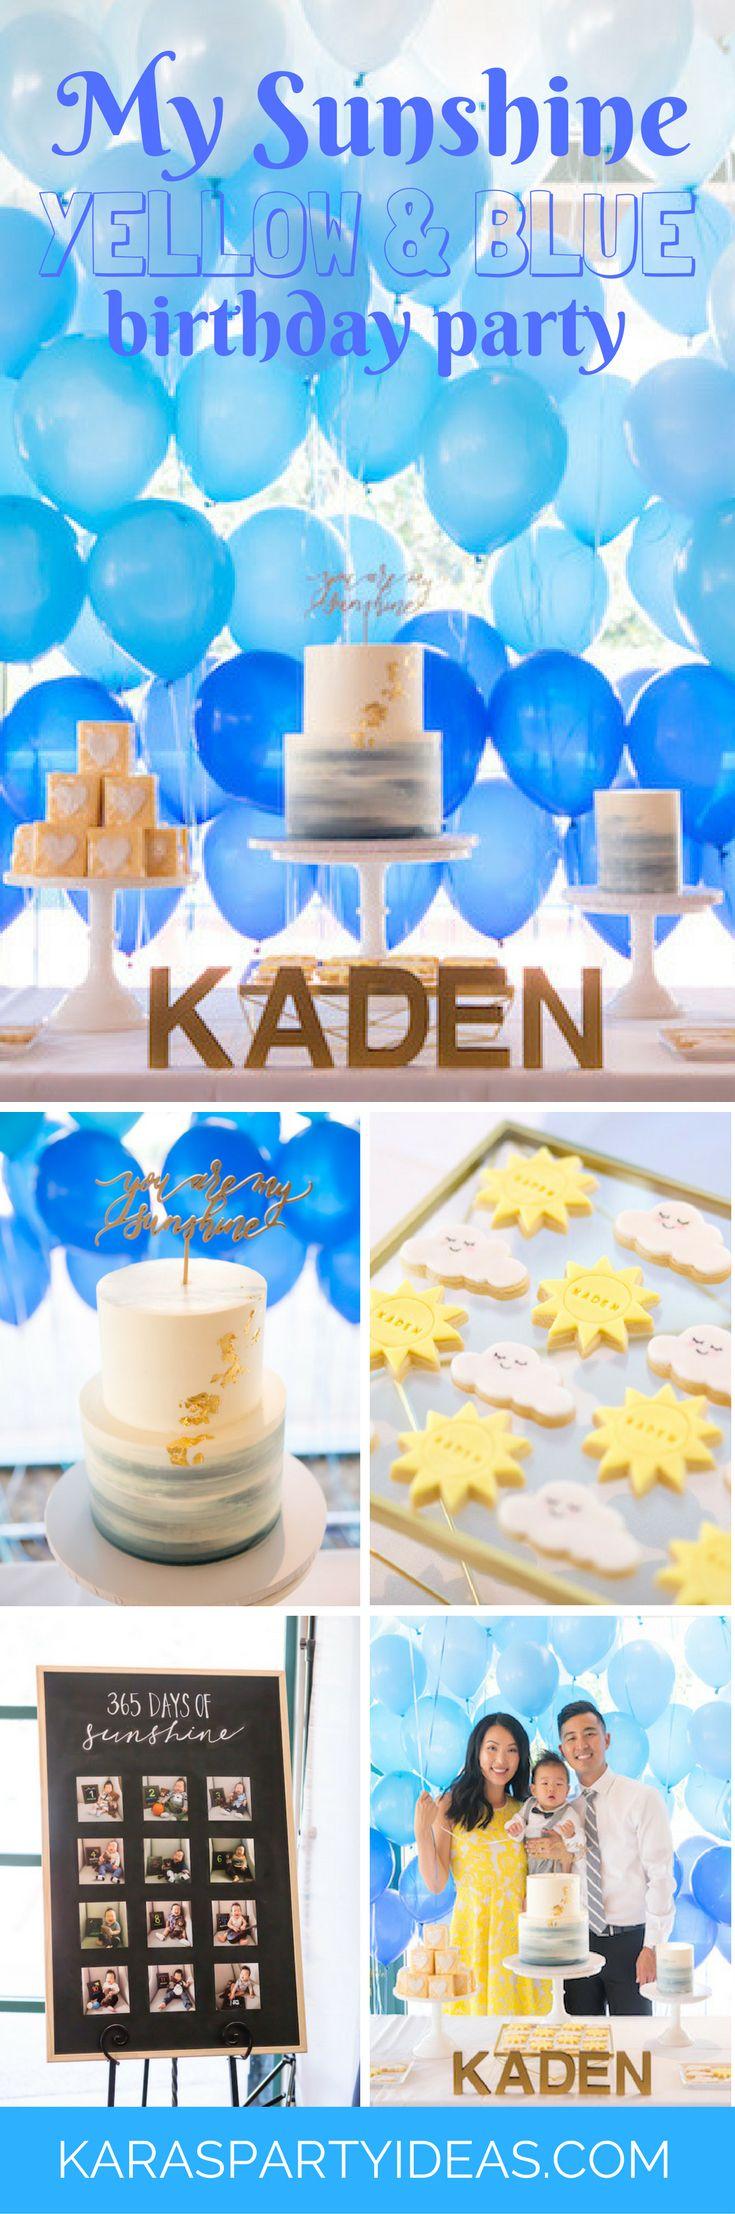 My Sunshine Yellow and Blue Birthday Party - Karas Party Ideas via KarasPartyIdeas.com